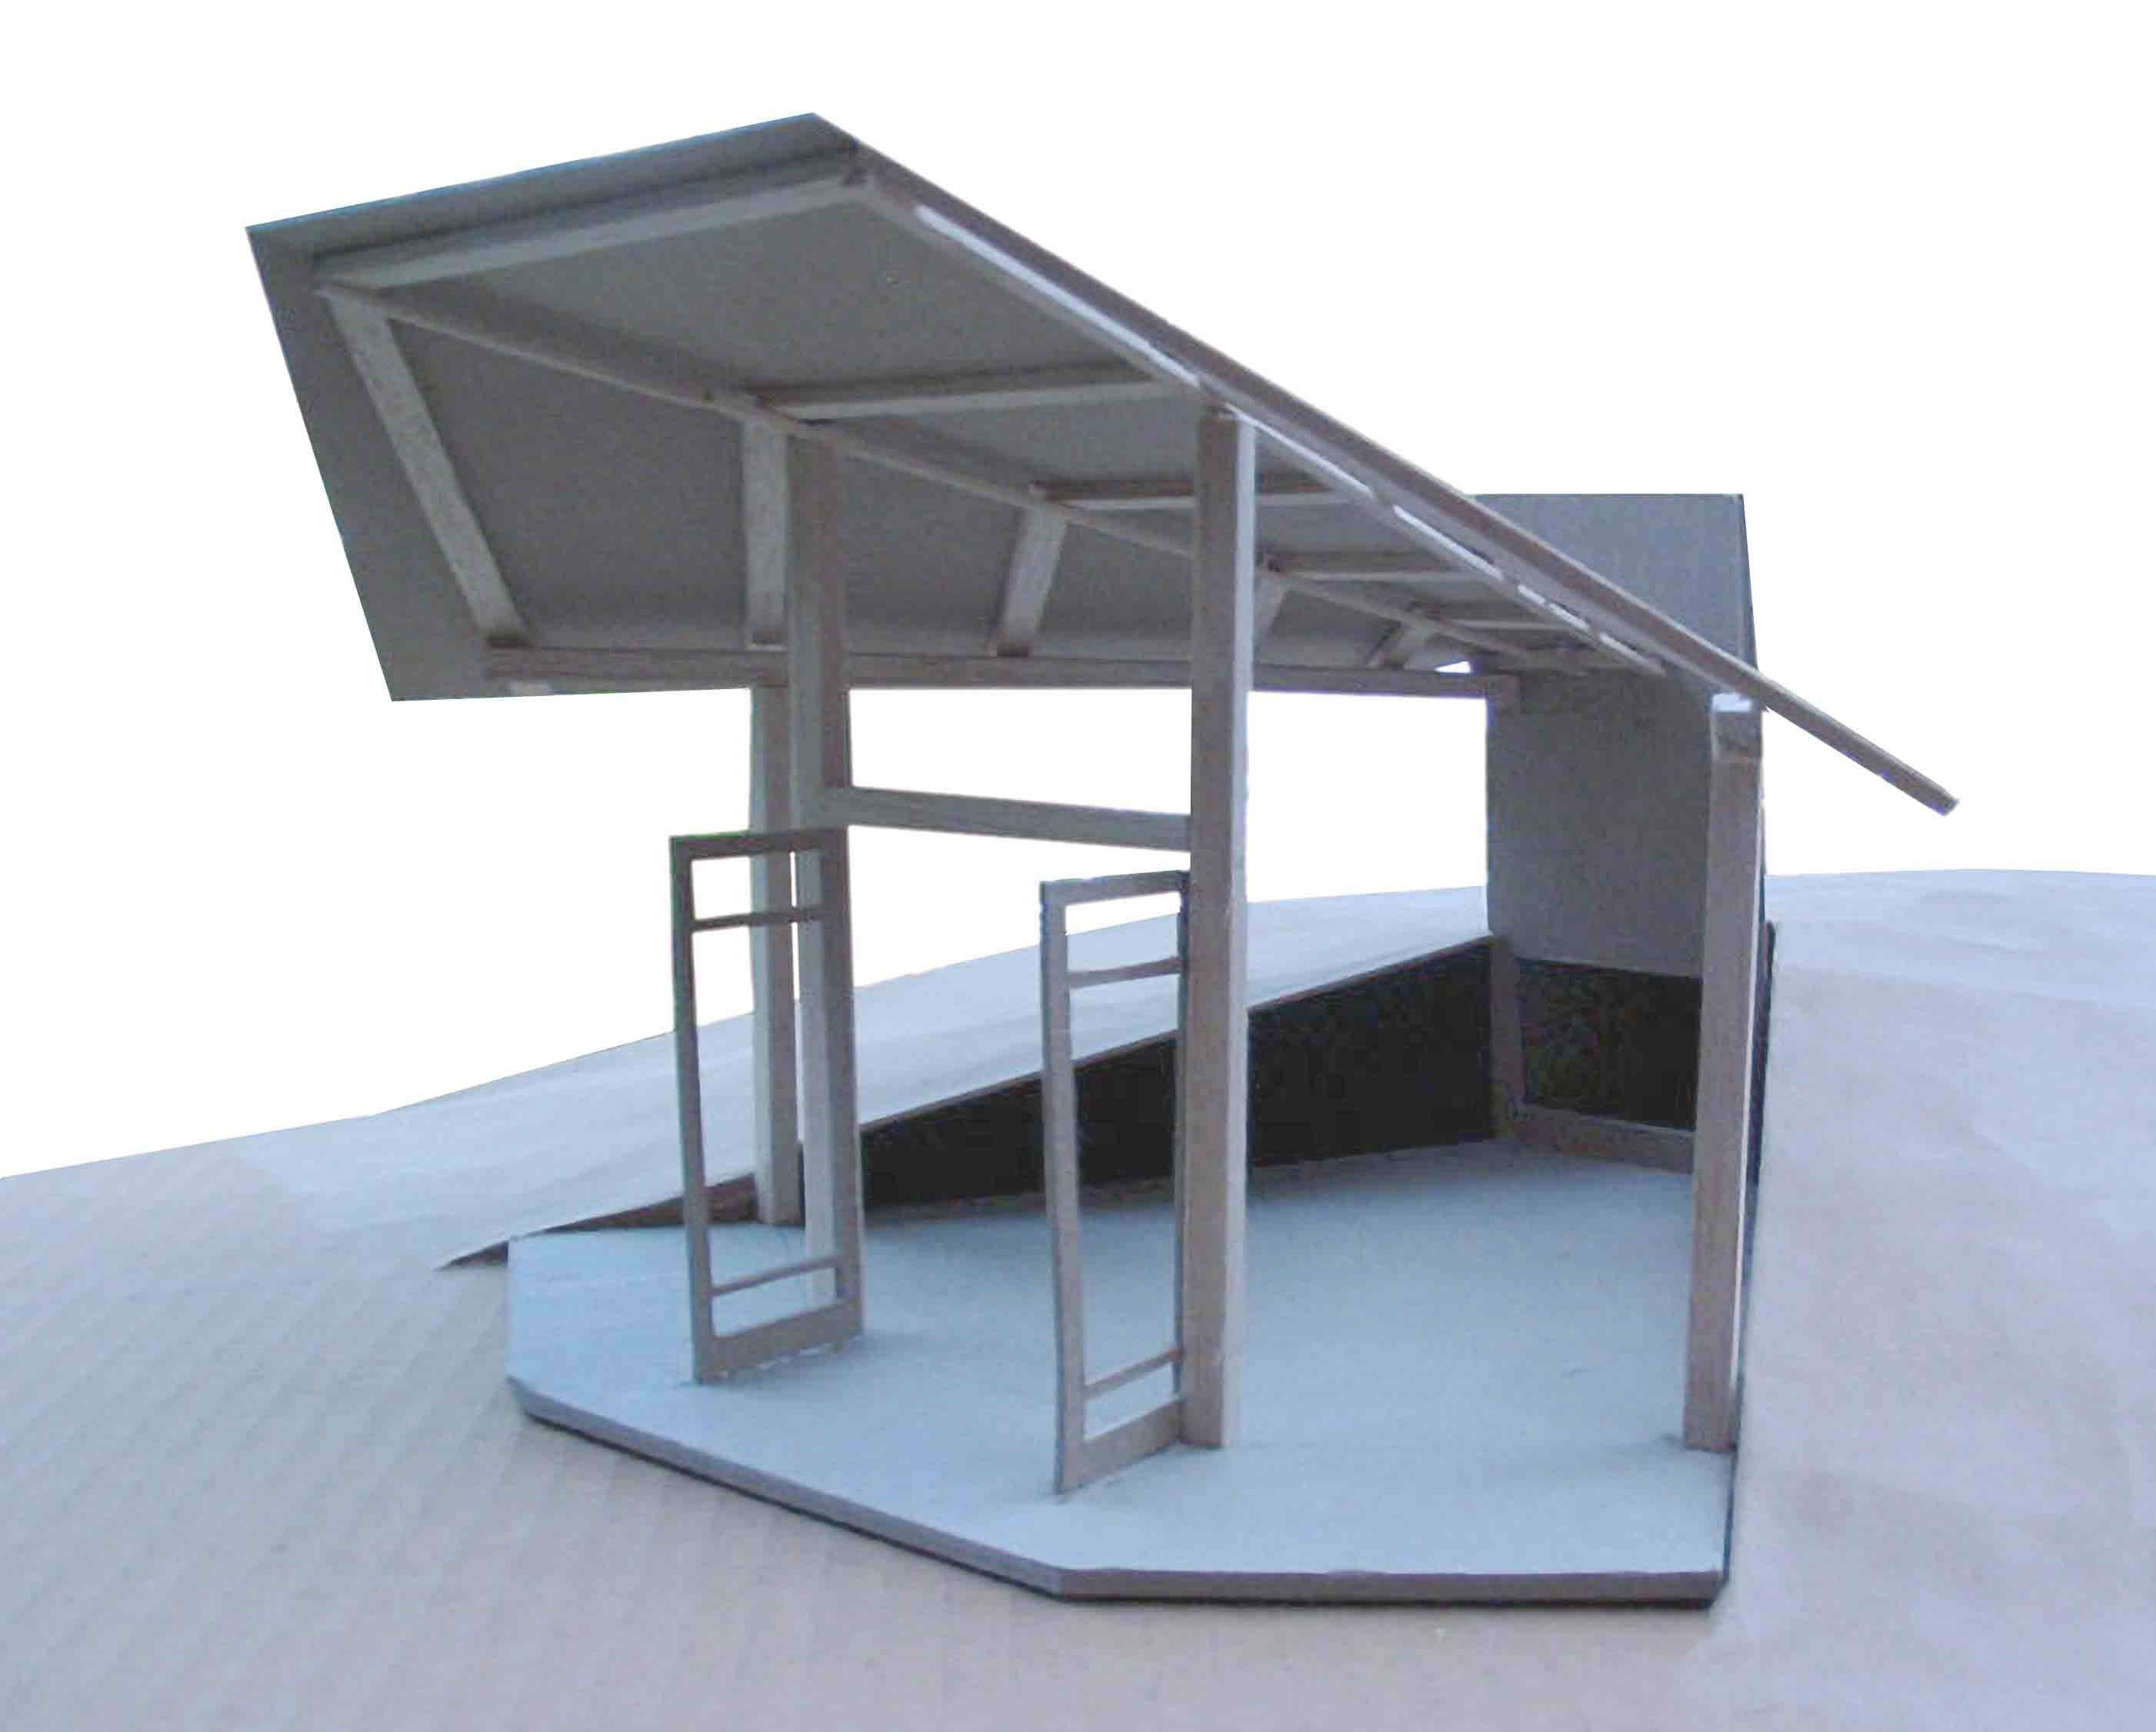 Fireplace Screen Porch model